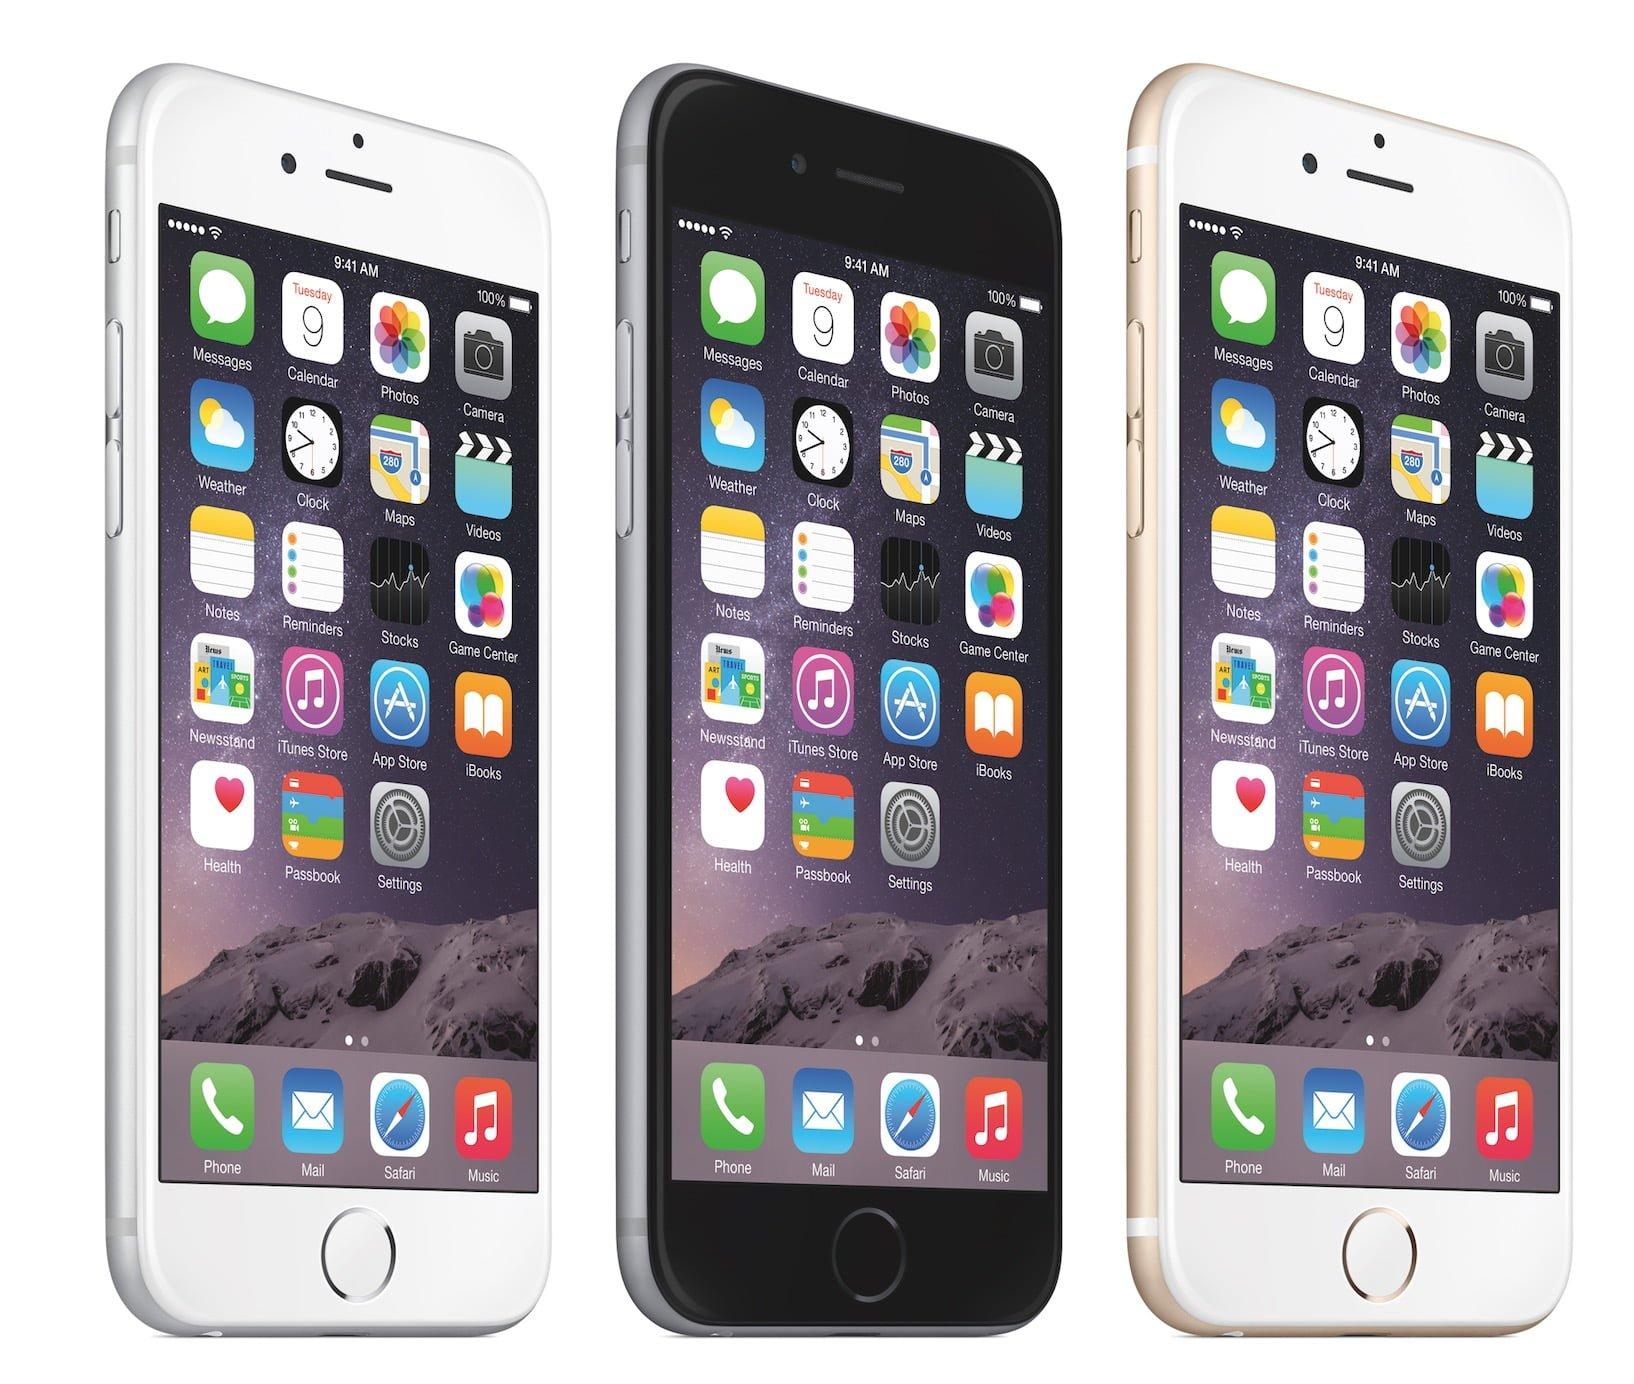 sammenlign pris IPhone 5S 64, gB - Apple - Smartfony / Telefony komrkowe